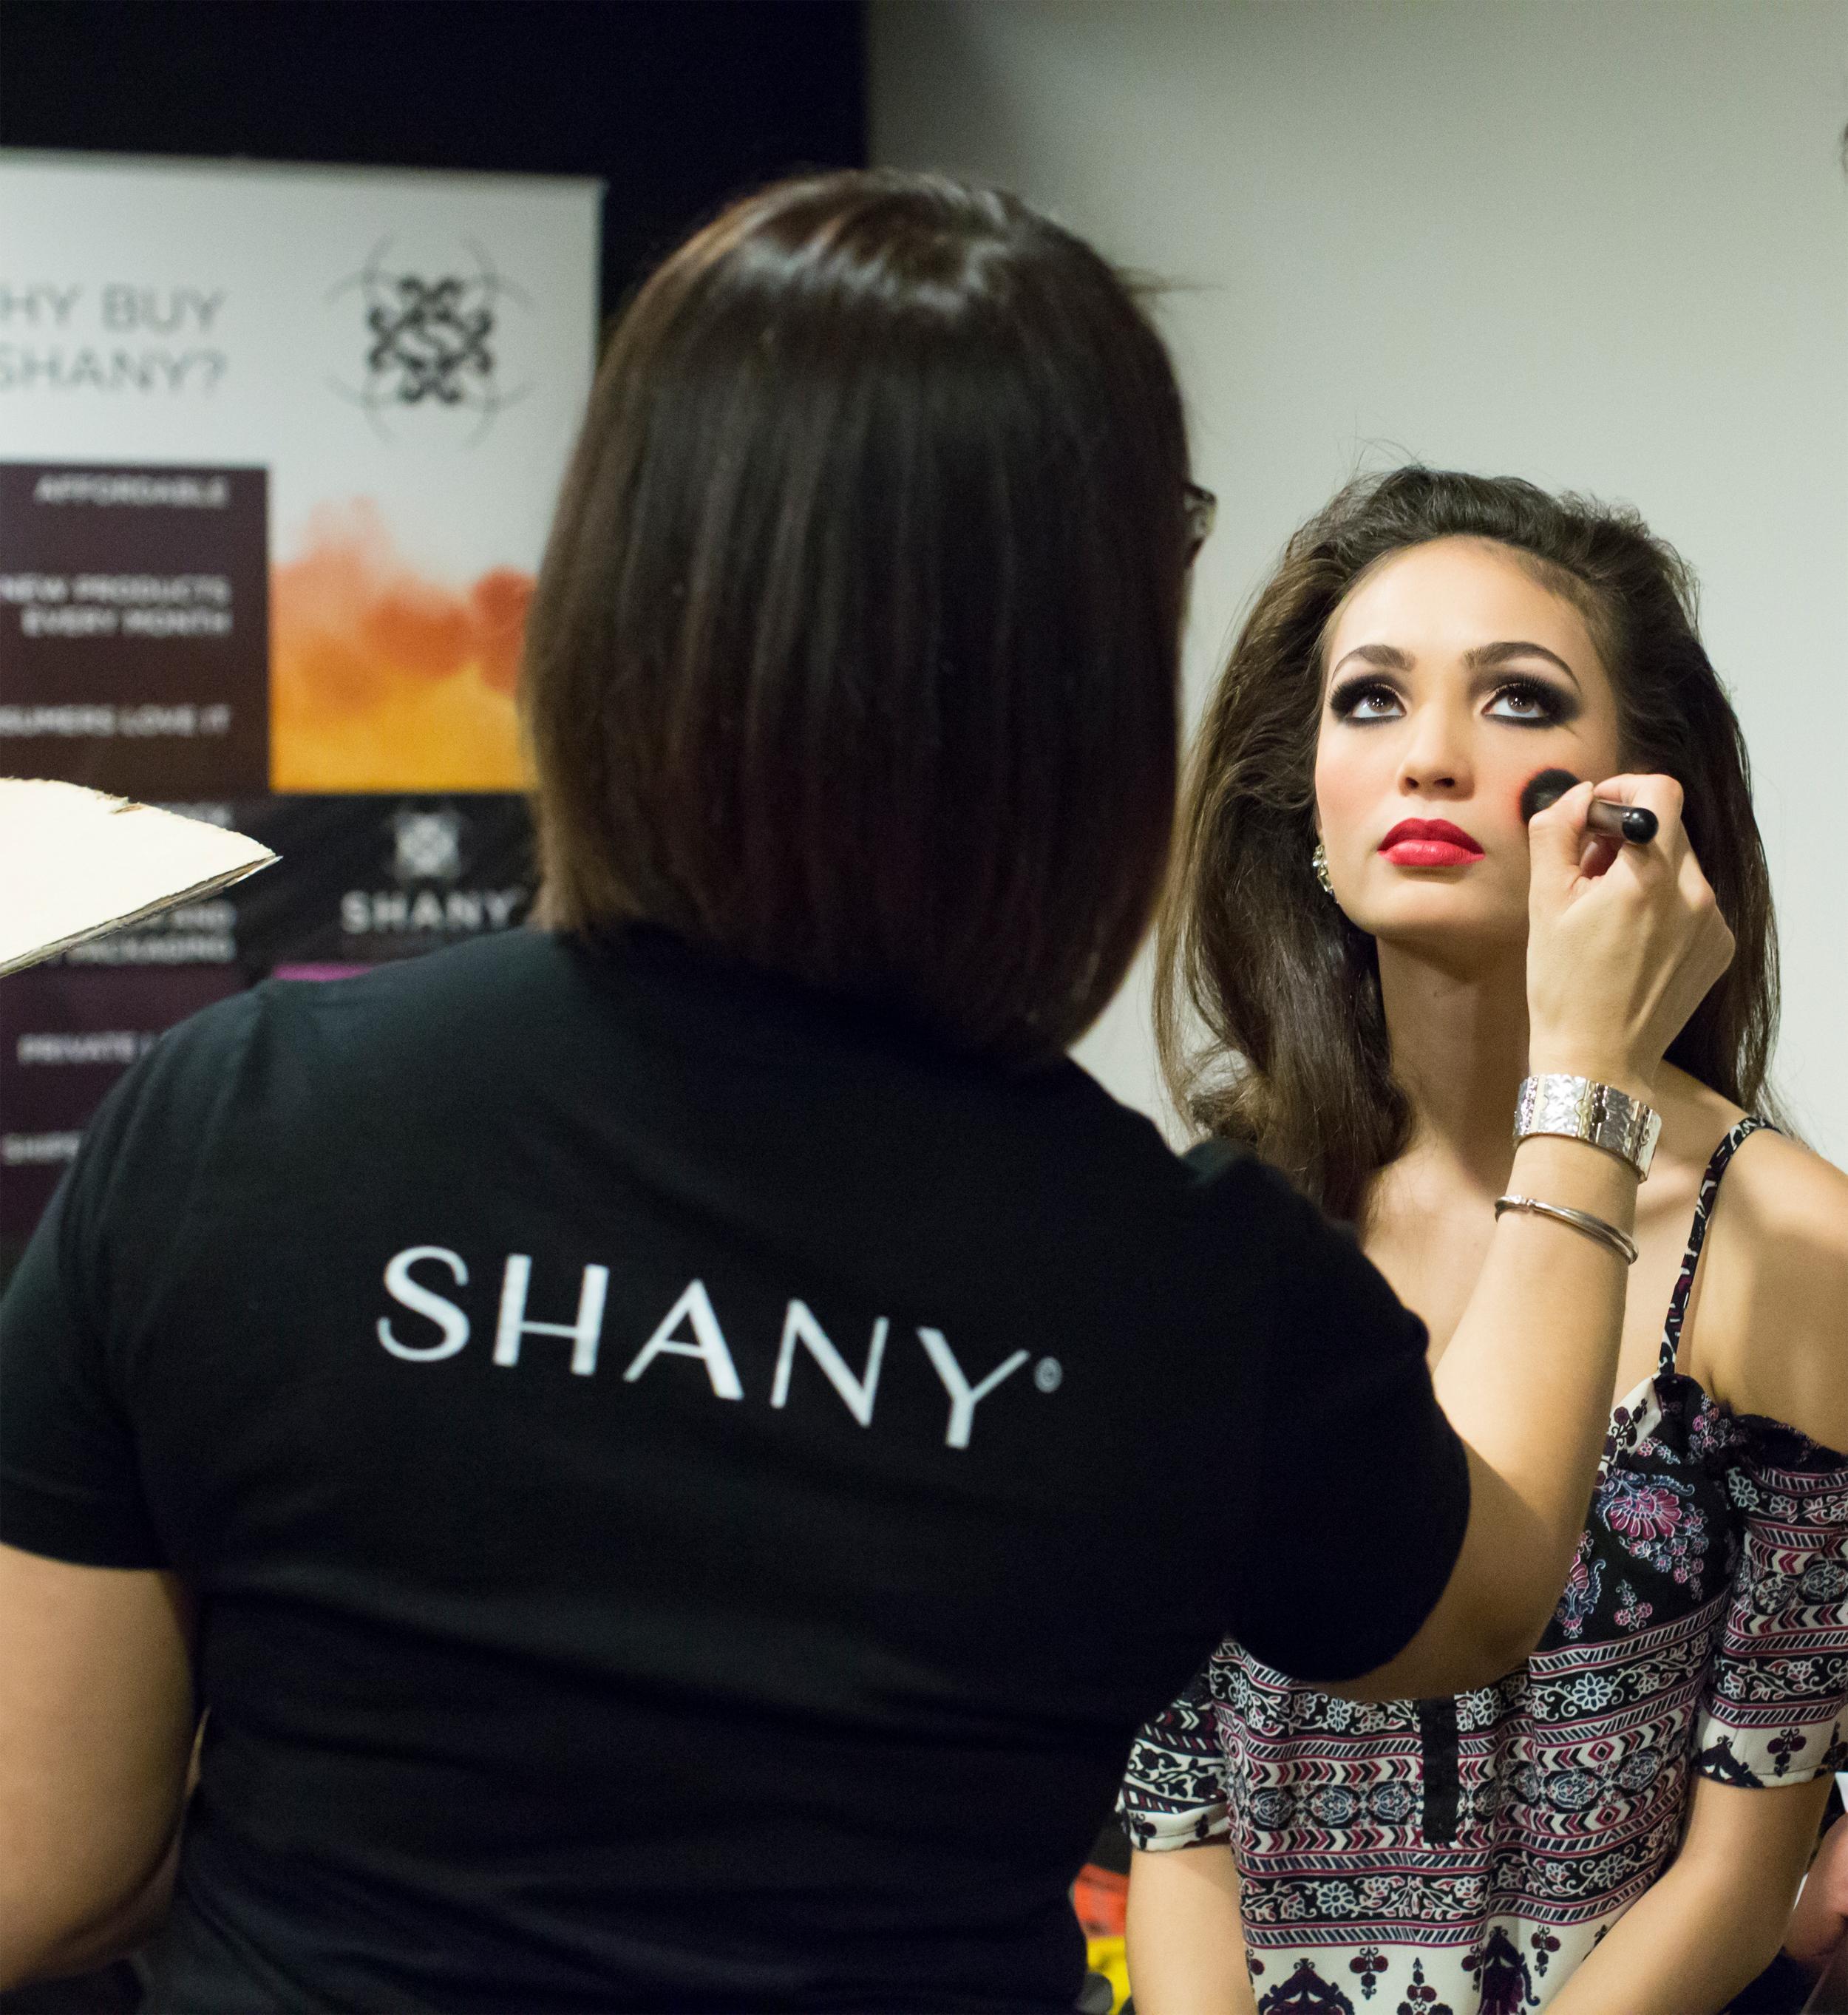 Amazon.com: SHANY The Mini Masterpiece 6 Layers Foundation, Concealer